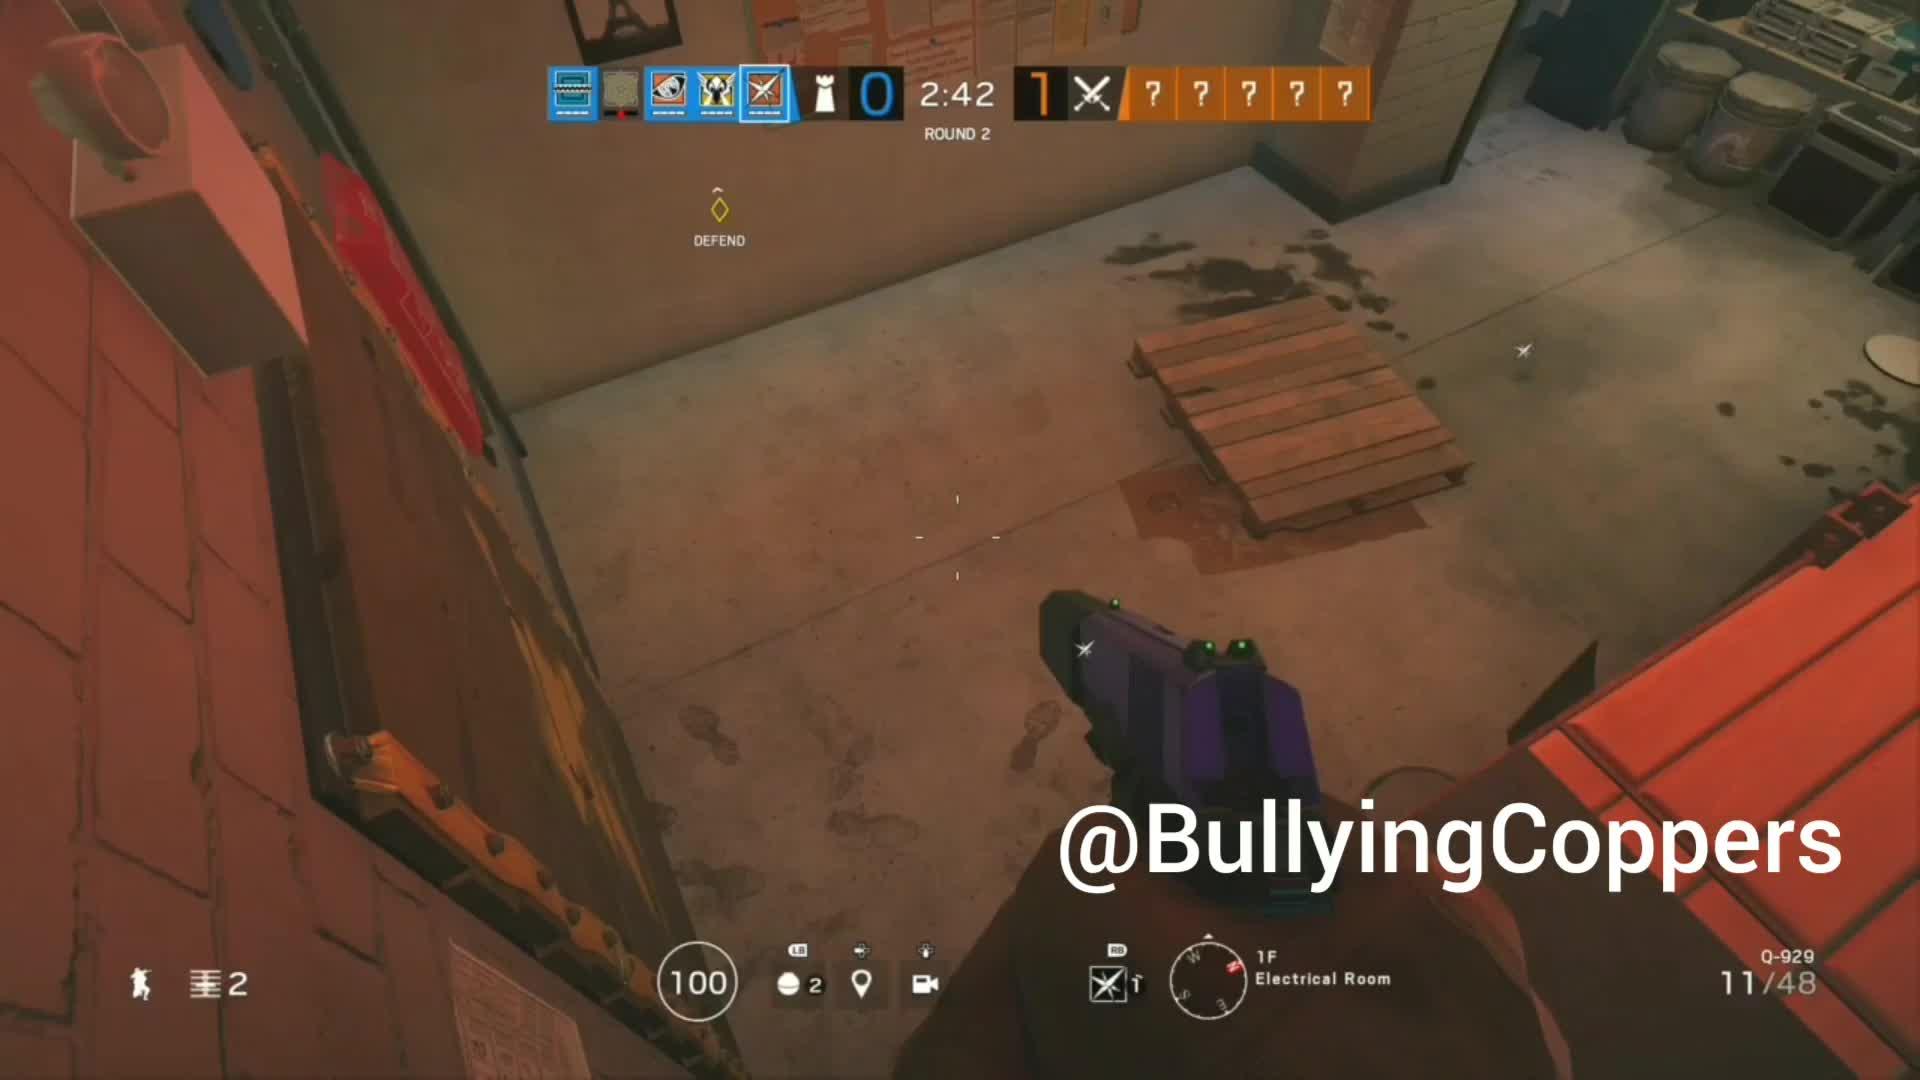 This is so unfortunate Rainbow6 GIFs